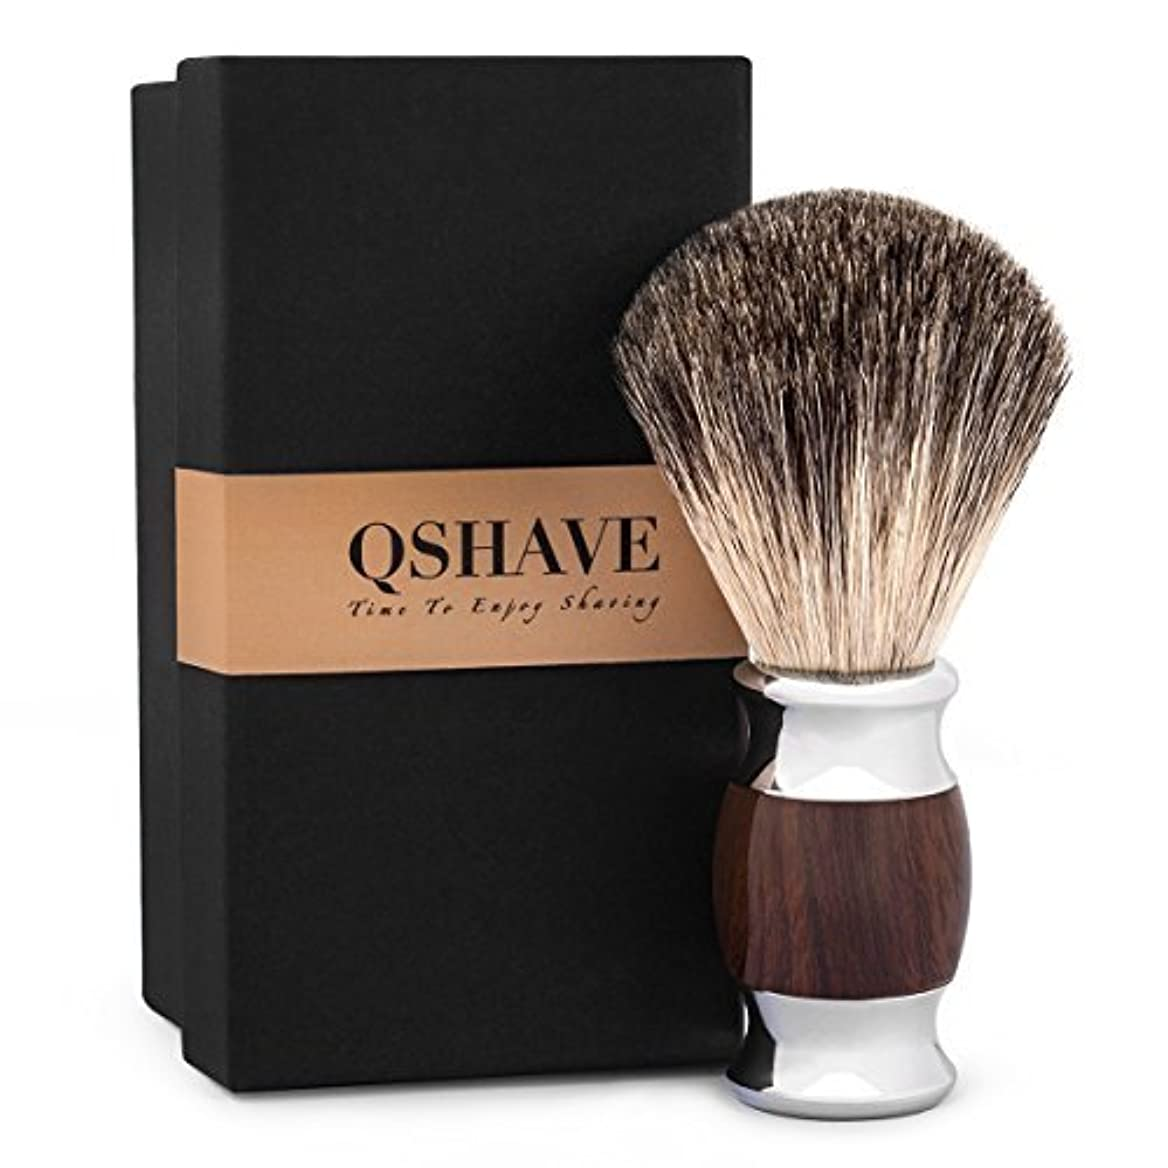 QSHAVE 100%アナグマ毛 木目調ハンドル オリジナルハンドメイドシェービングブラシ。ウェットシェービング、安全カミソリ、両刃カミソリに最適